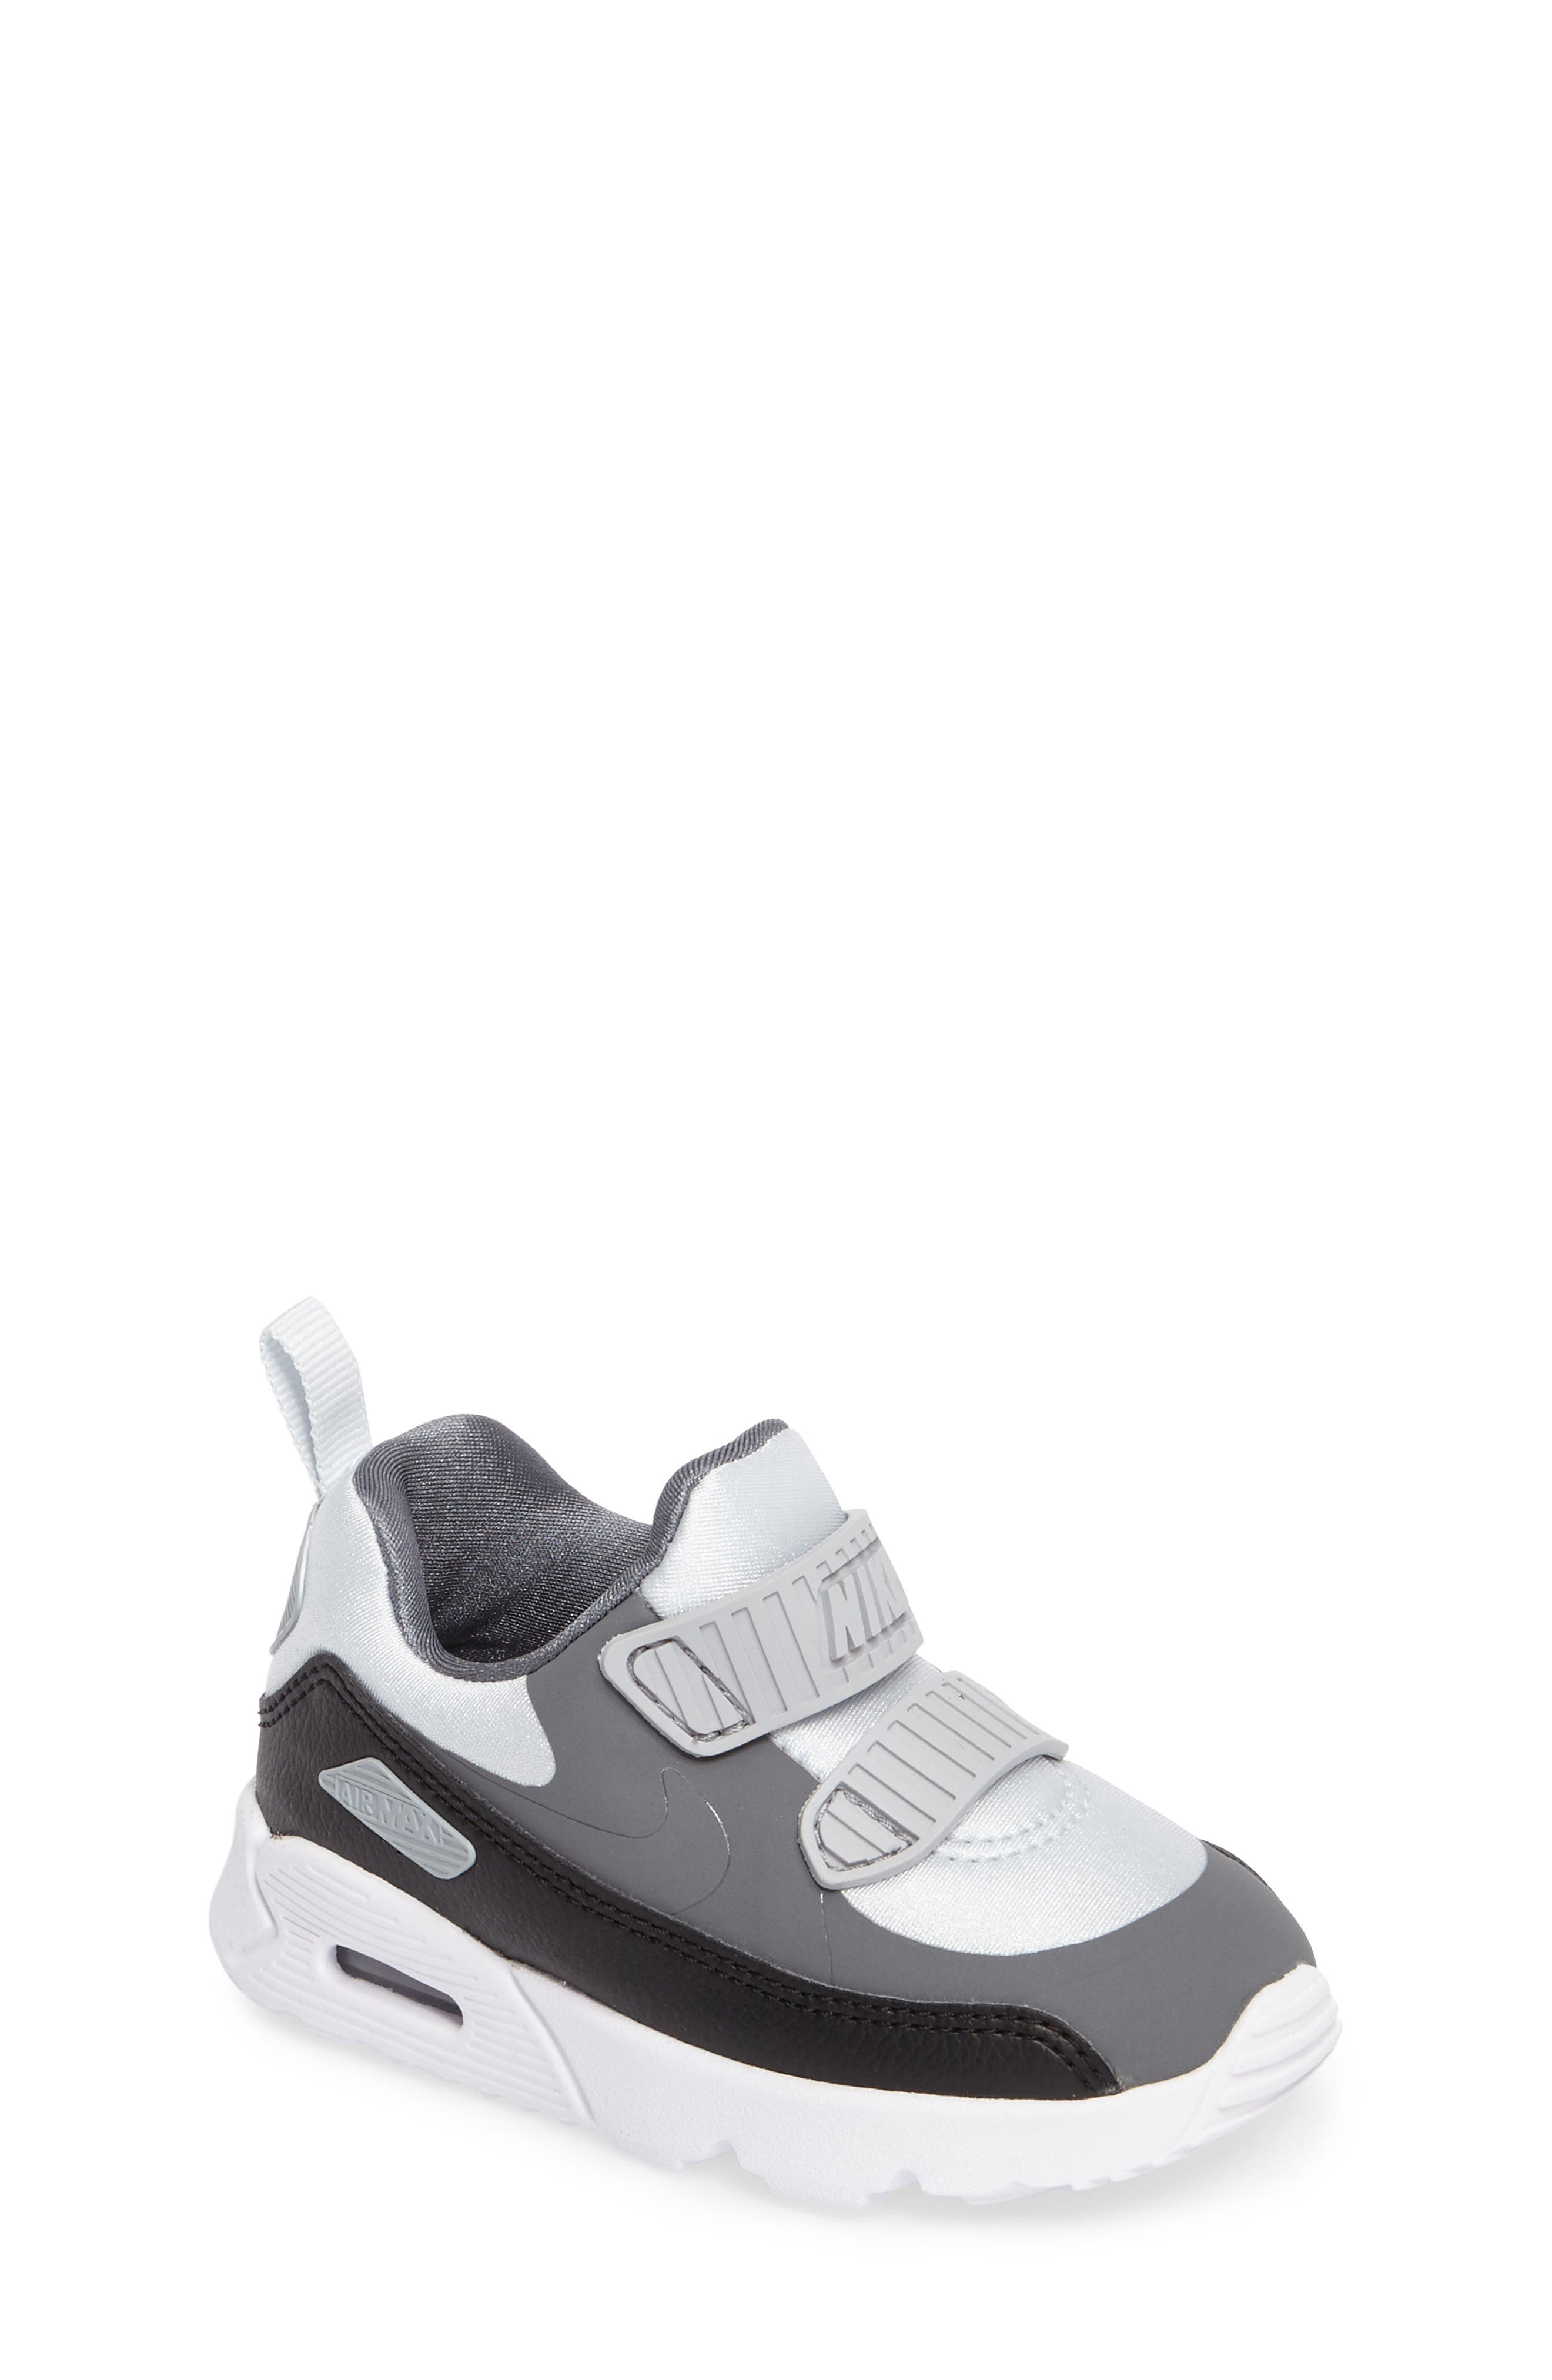 Air Max Tiny 90 Sneaker,                         Main,                         color, 022